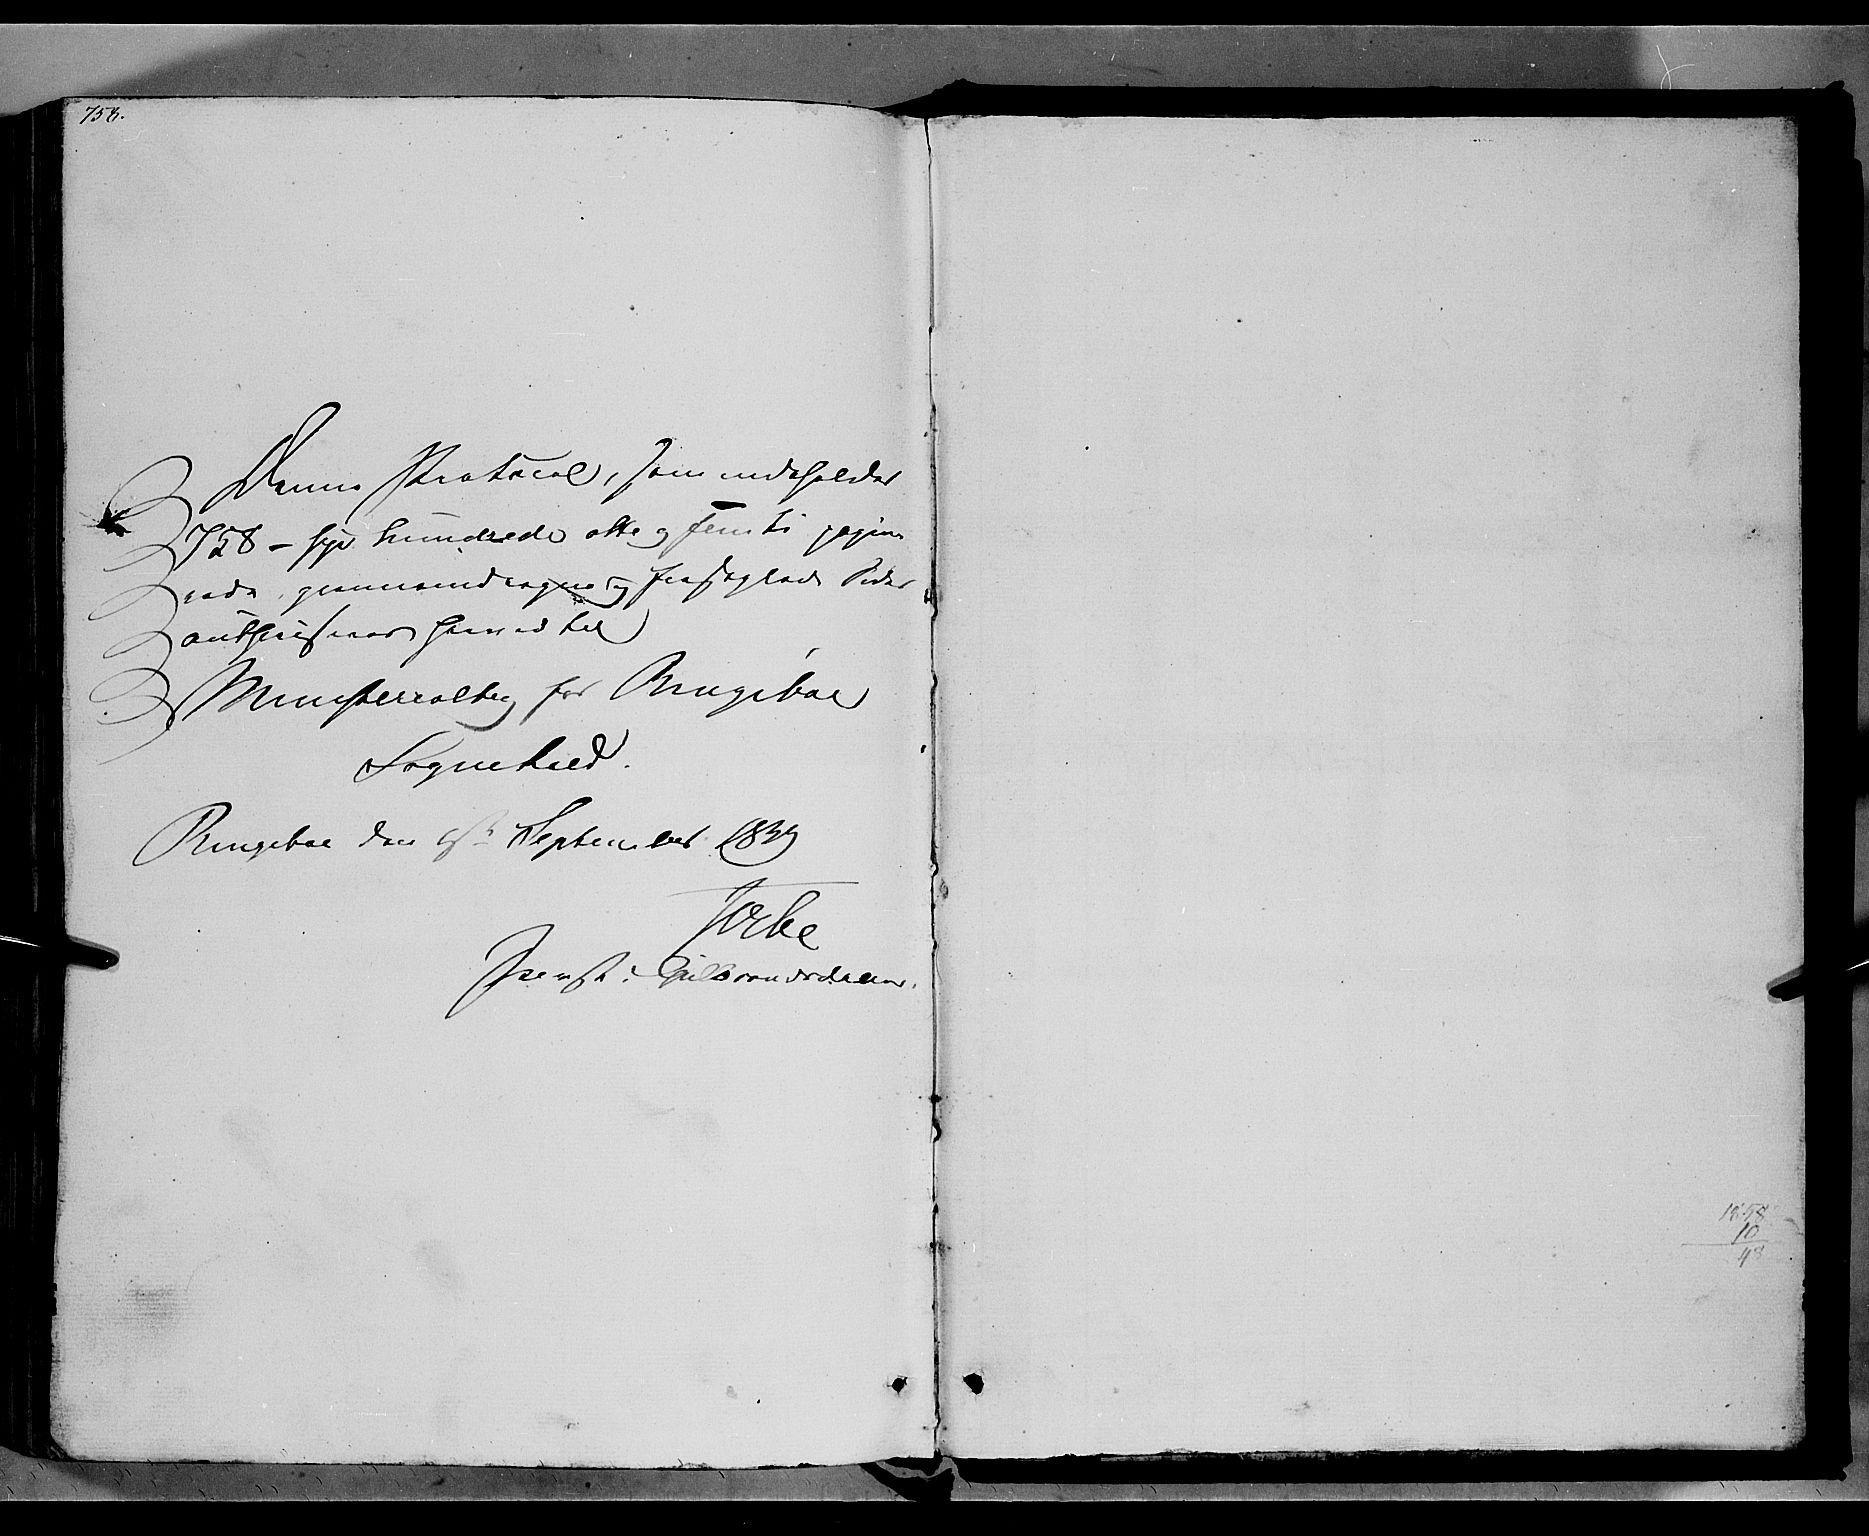 SAH, Ringebu prestekontor, Ministerialbok nr. 5, 1839-1848, s. 758